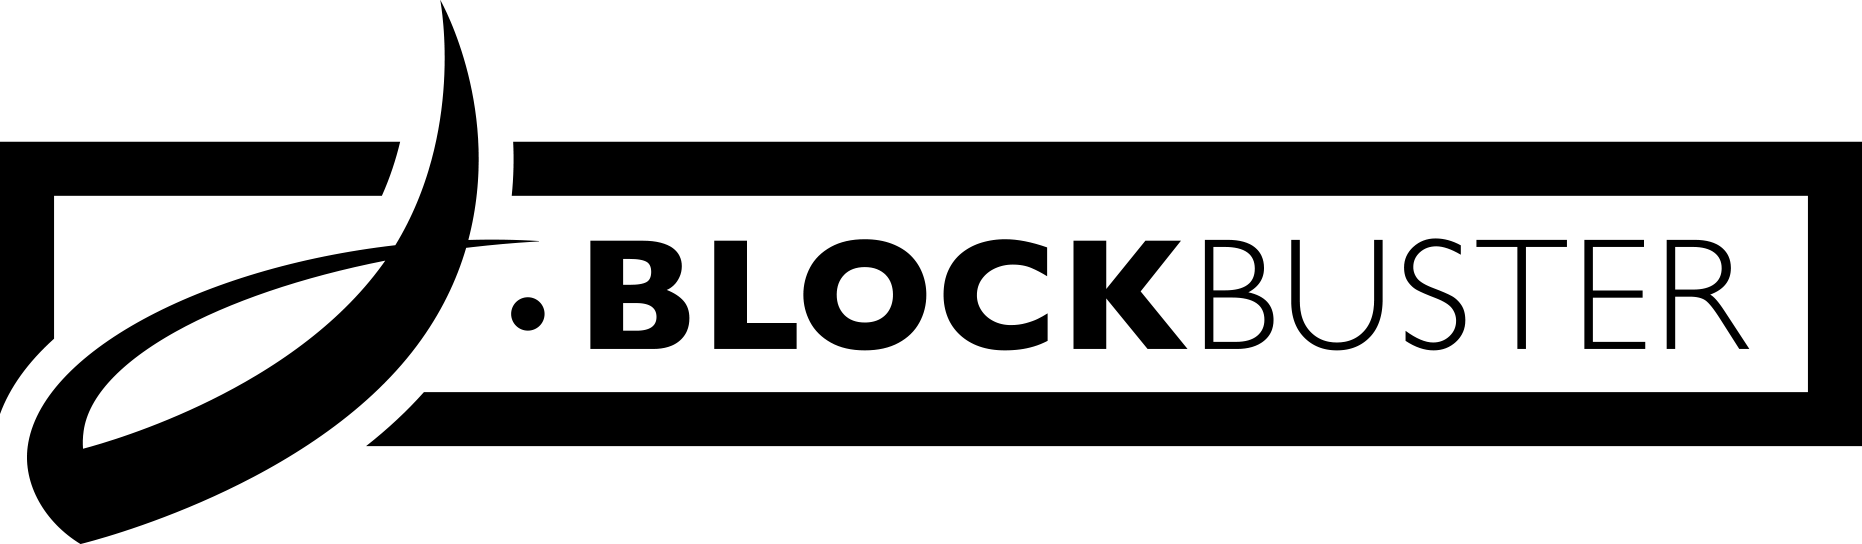 J-Blockbuster Logo